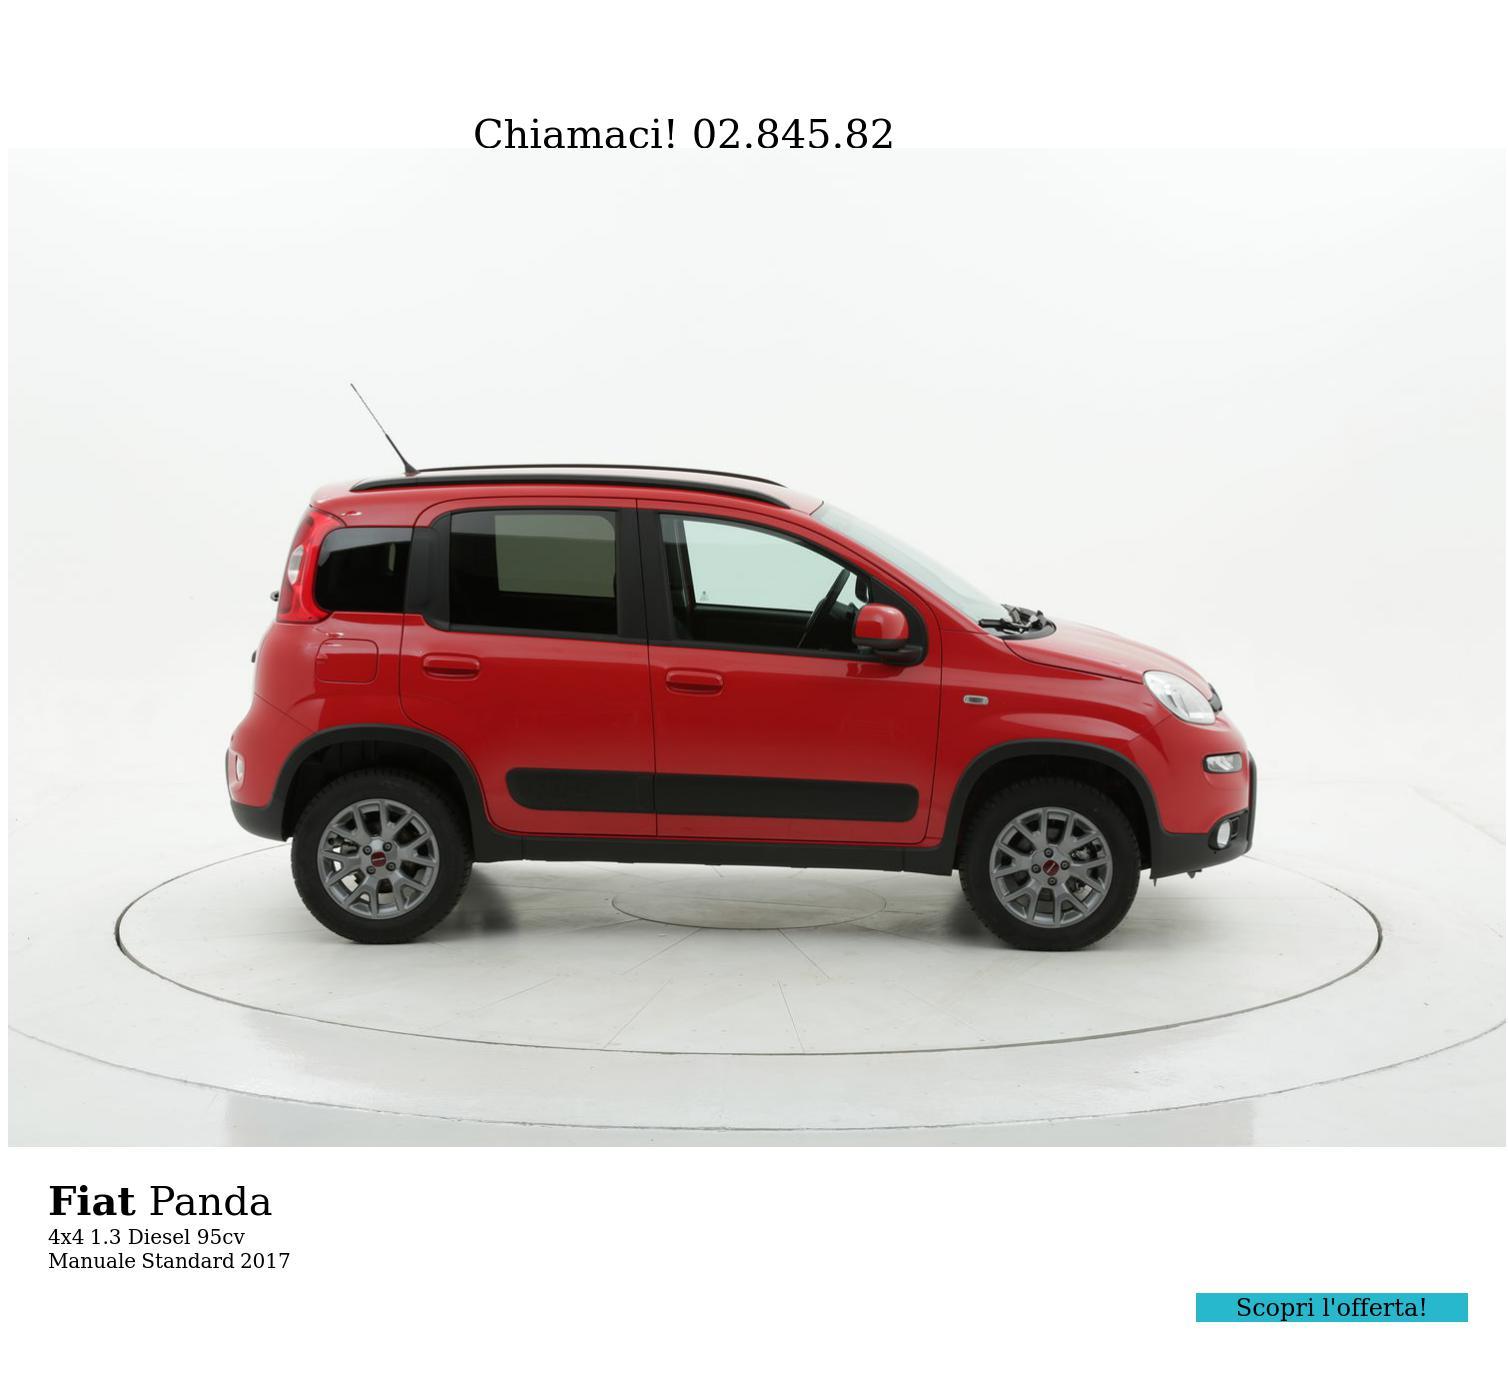 Fiat Panda 4x4 km 0 diesel rossa | brumbrum